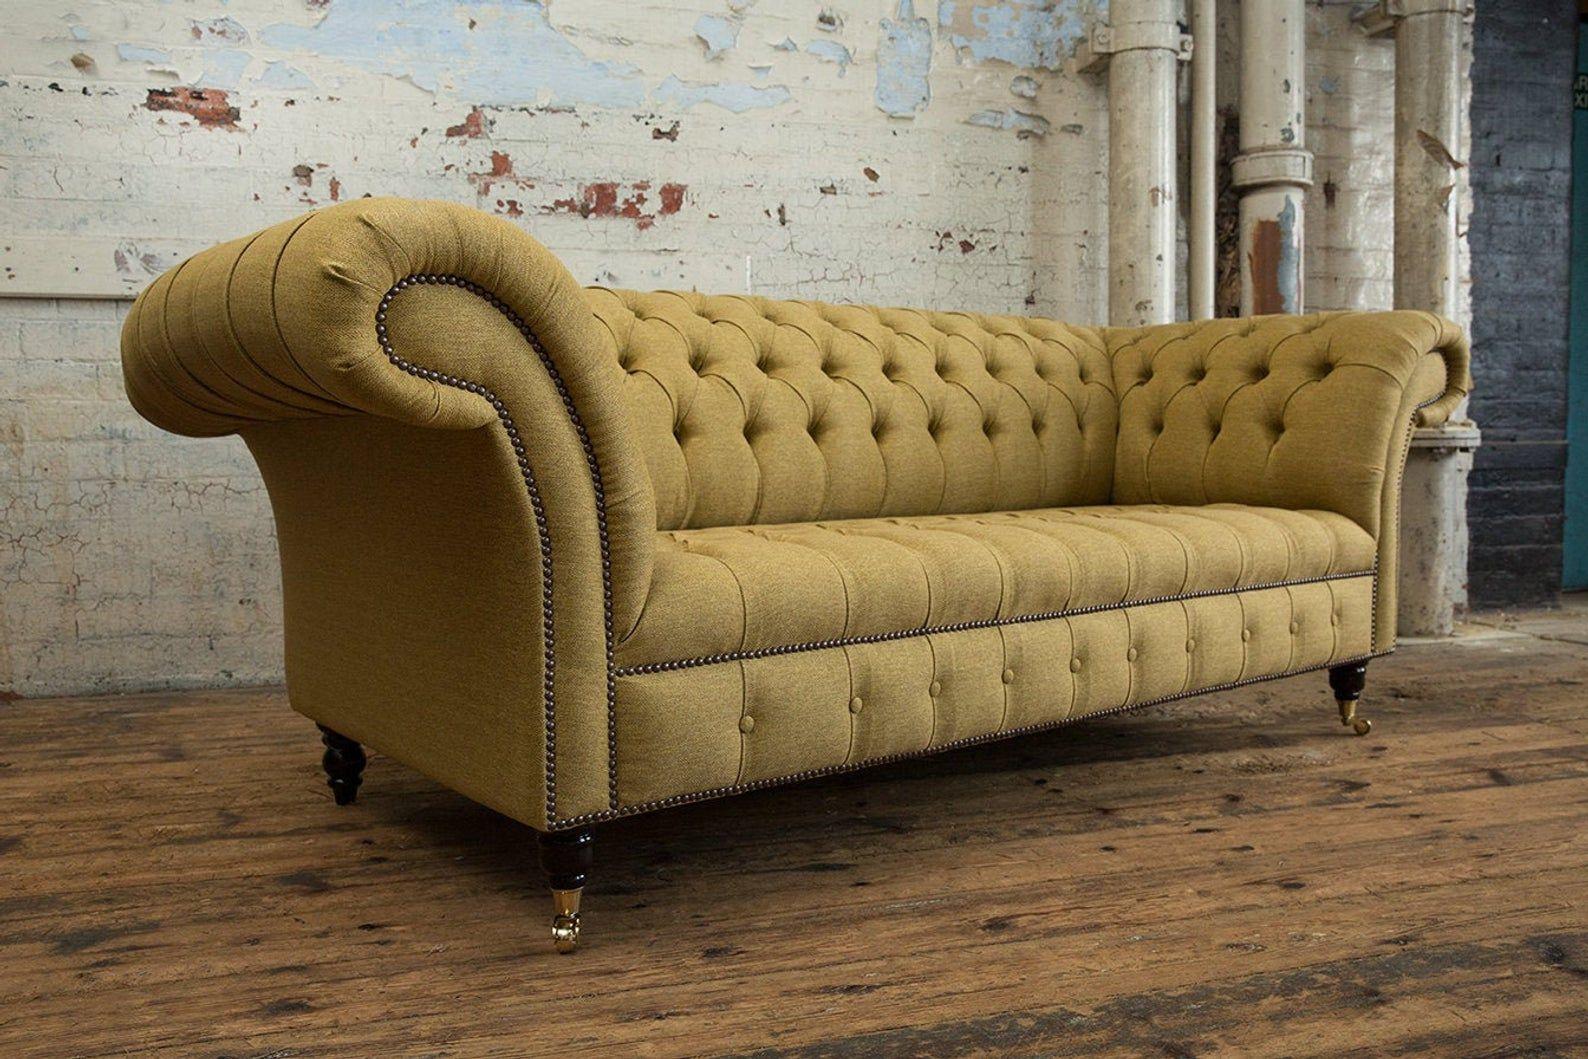 Handmade Gold Mustard Herringbone Wool 3 Seater Chesterfield Sofa Chesterfield Sofa Design Chesterfield Sofa Lovely Sofas